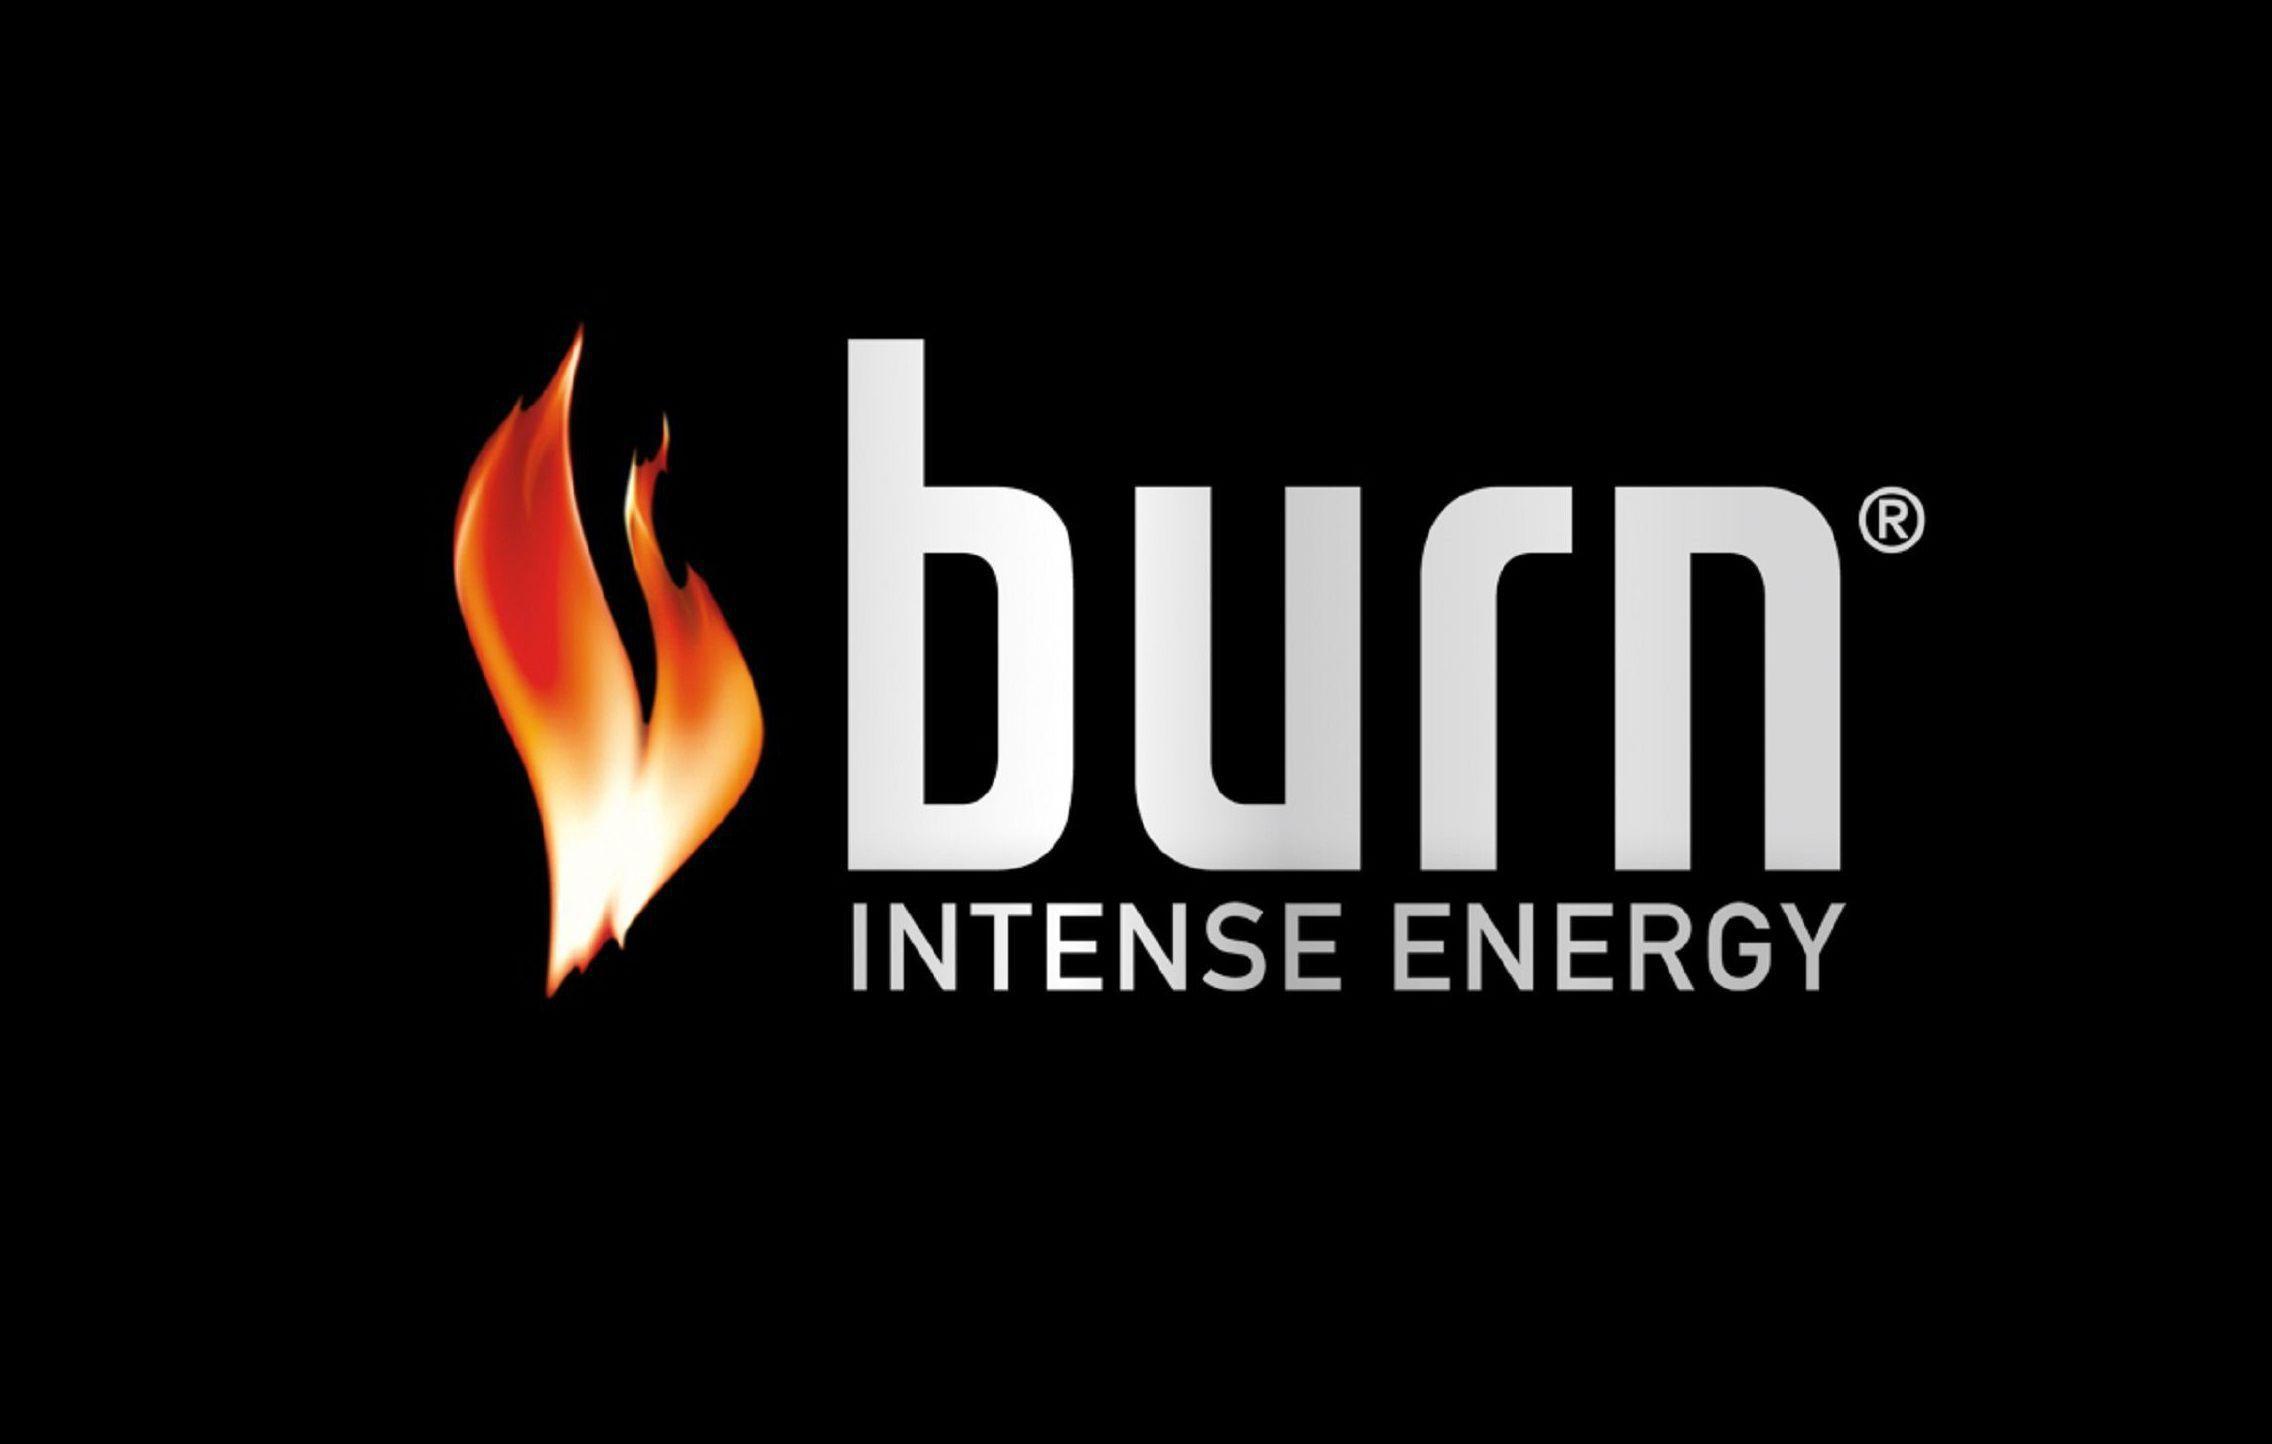 Burn Widescreen